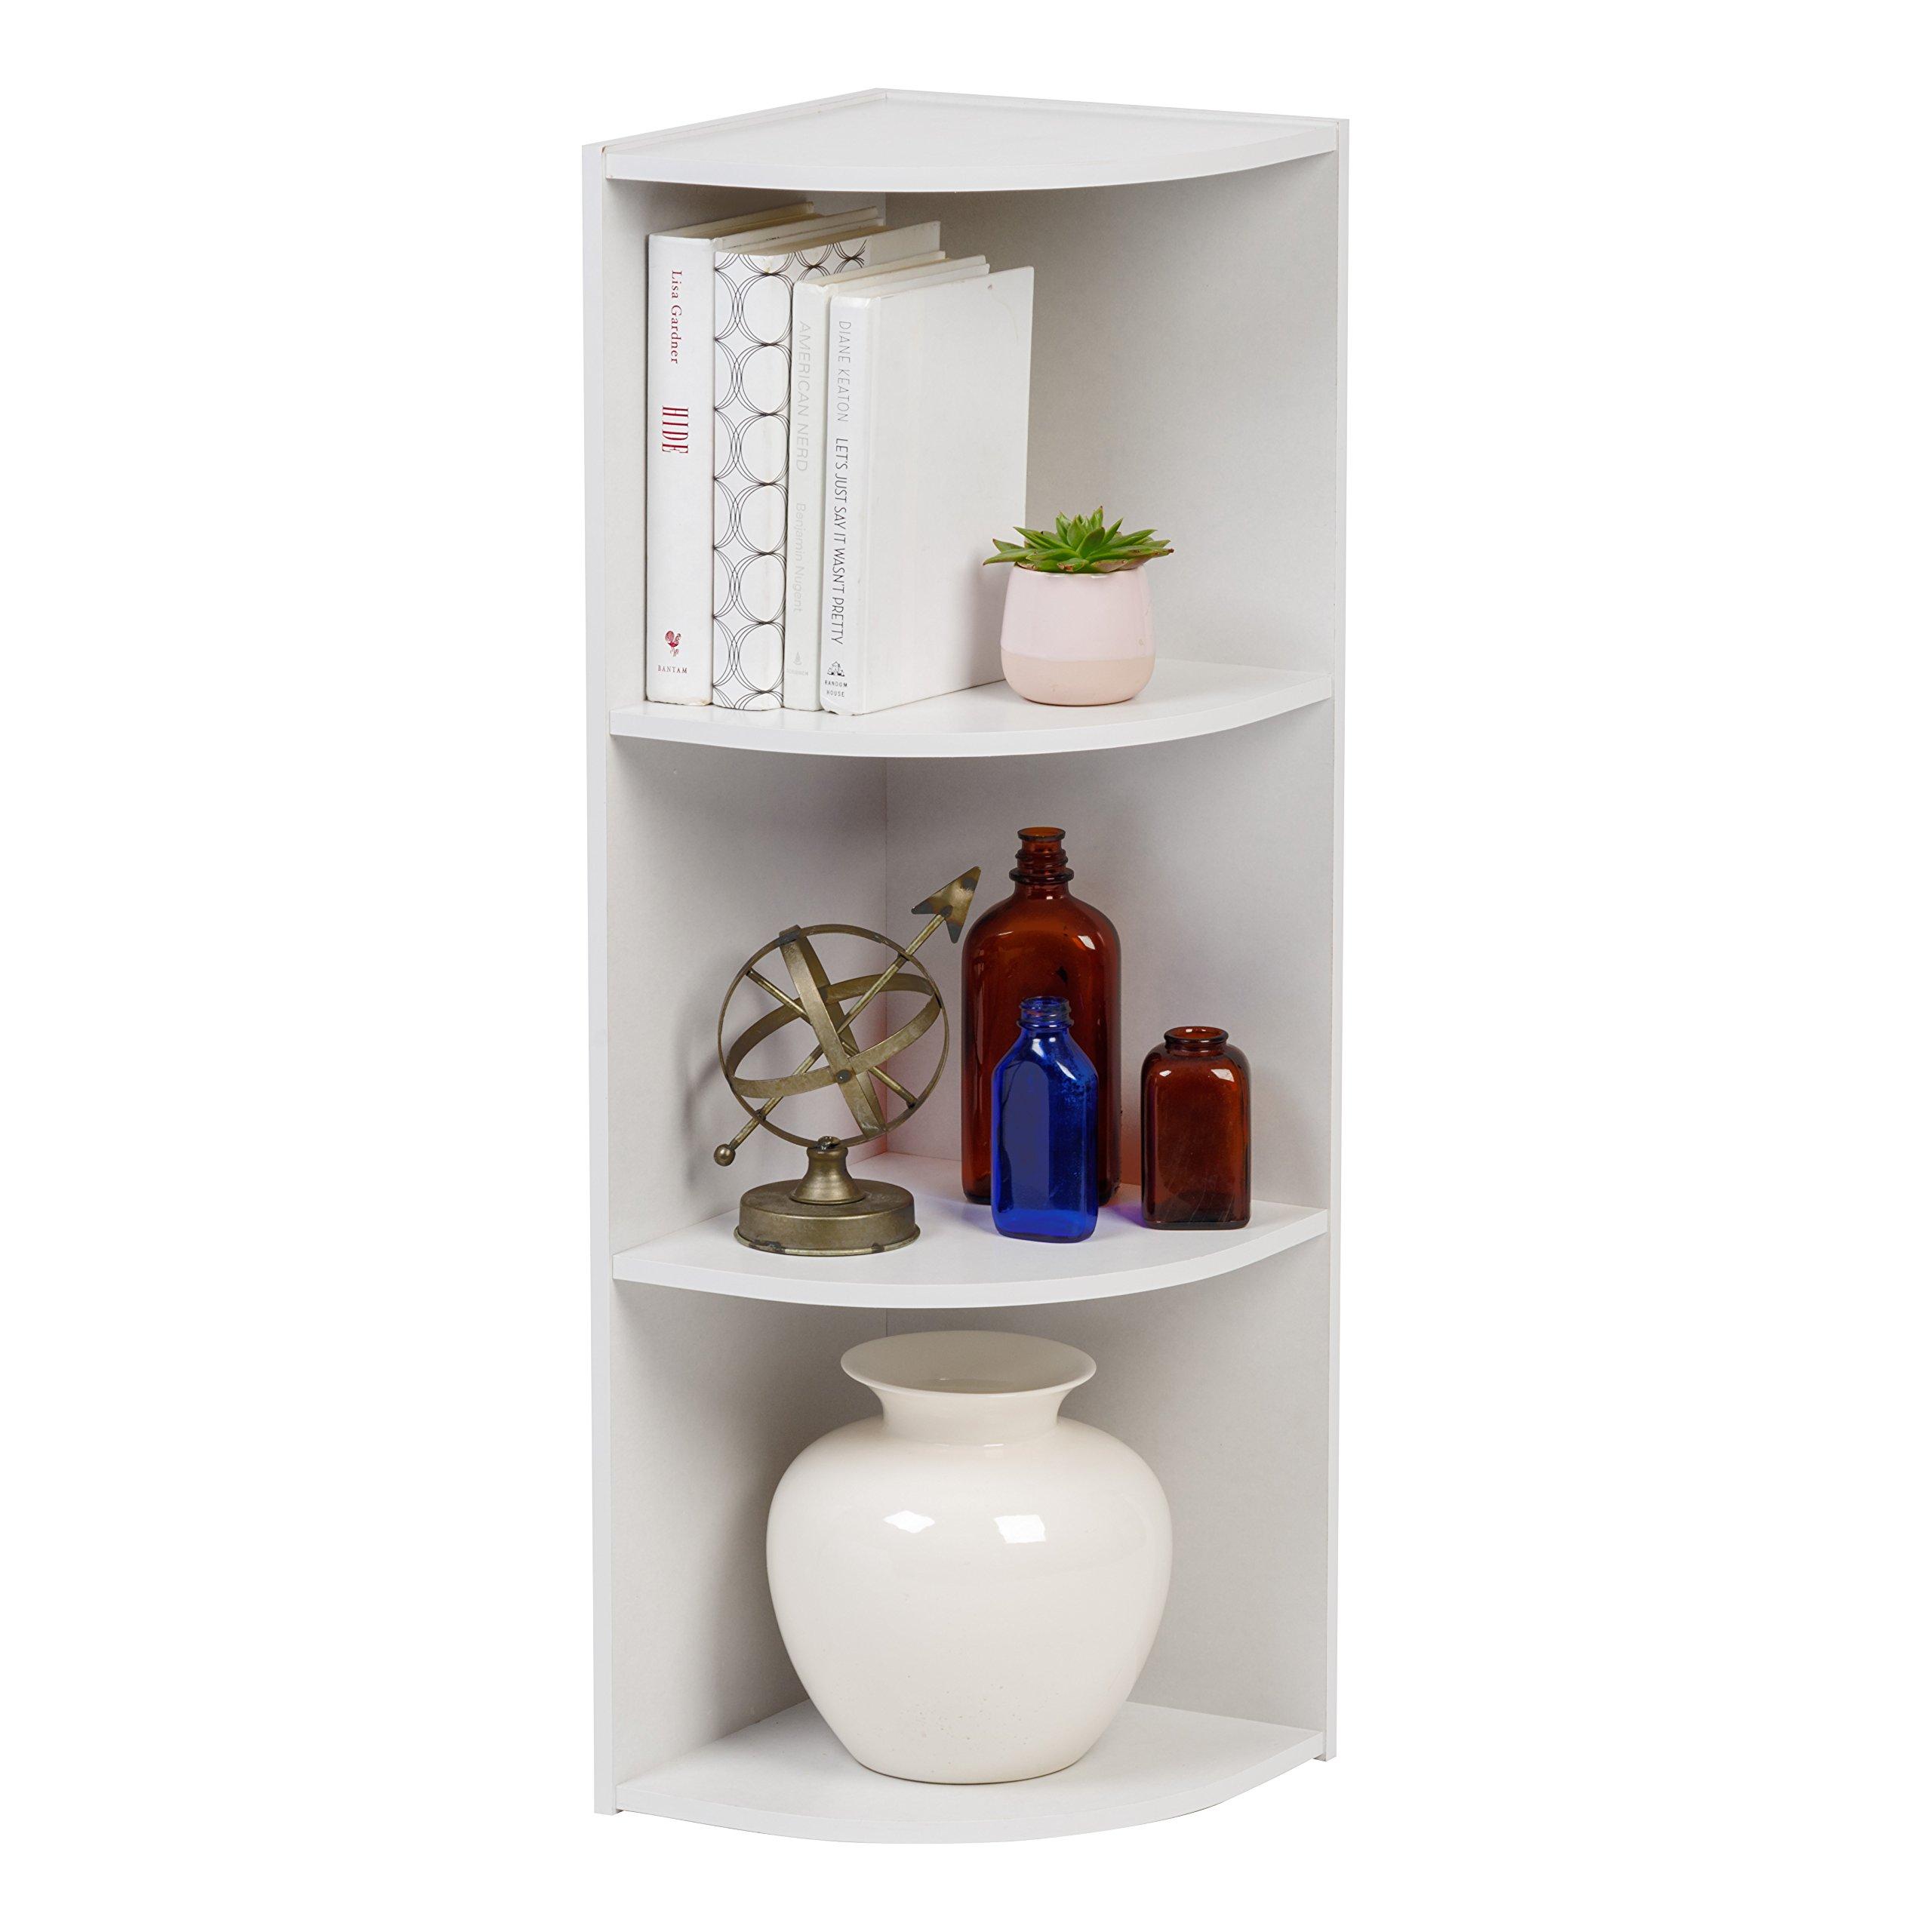 IRIS 3-Tier Corner Curved Shelf Organizer, White